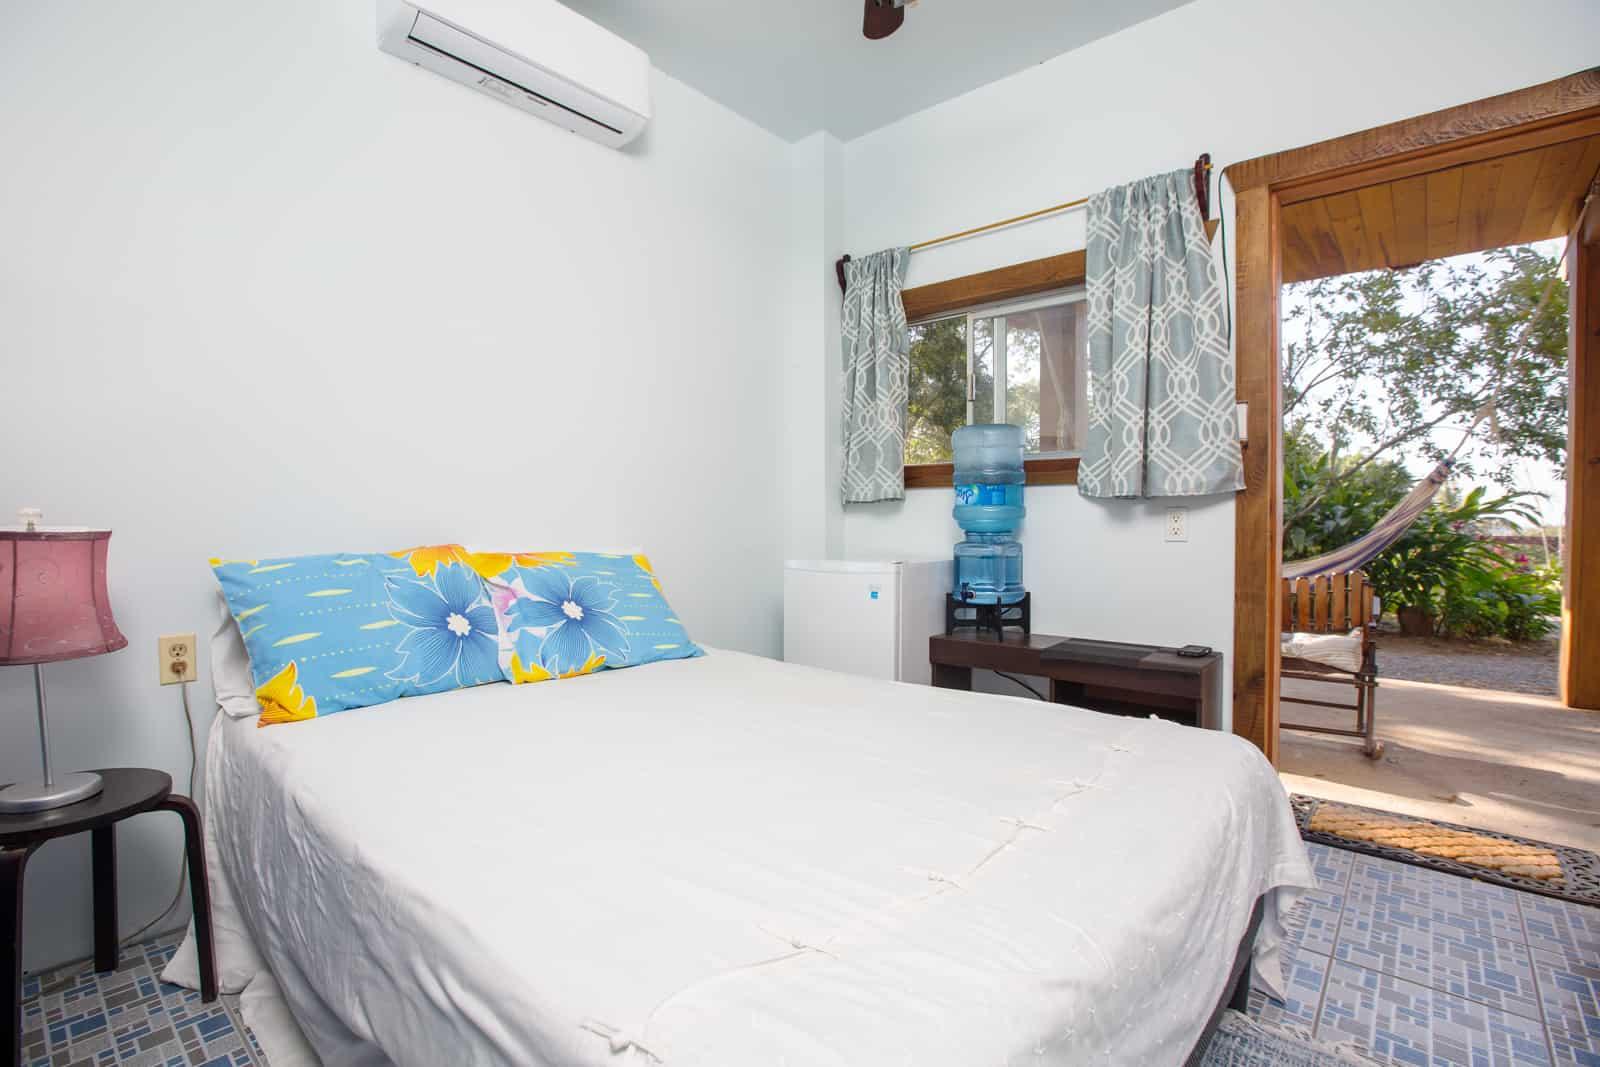 https://roatan-guavagrove.com/wp-content/uploads/2020/03/garden-hotel-room-roatan-1.jpg